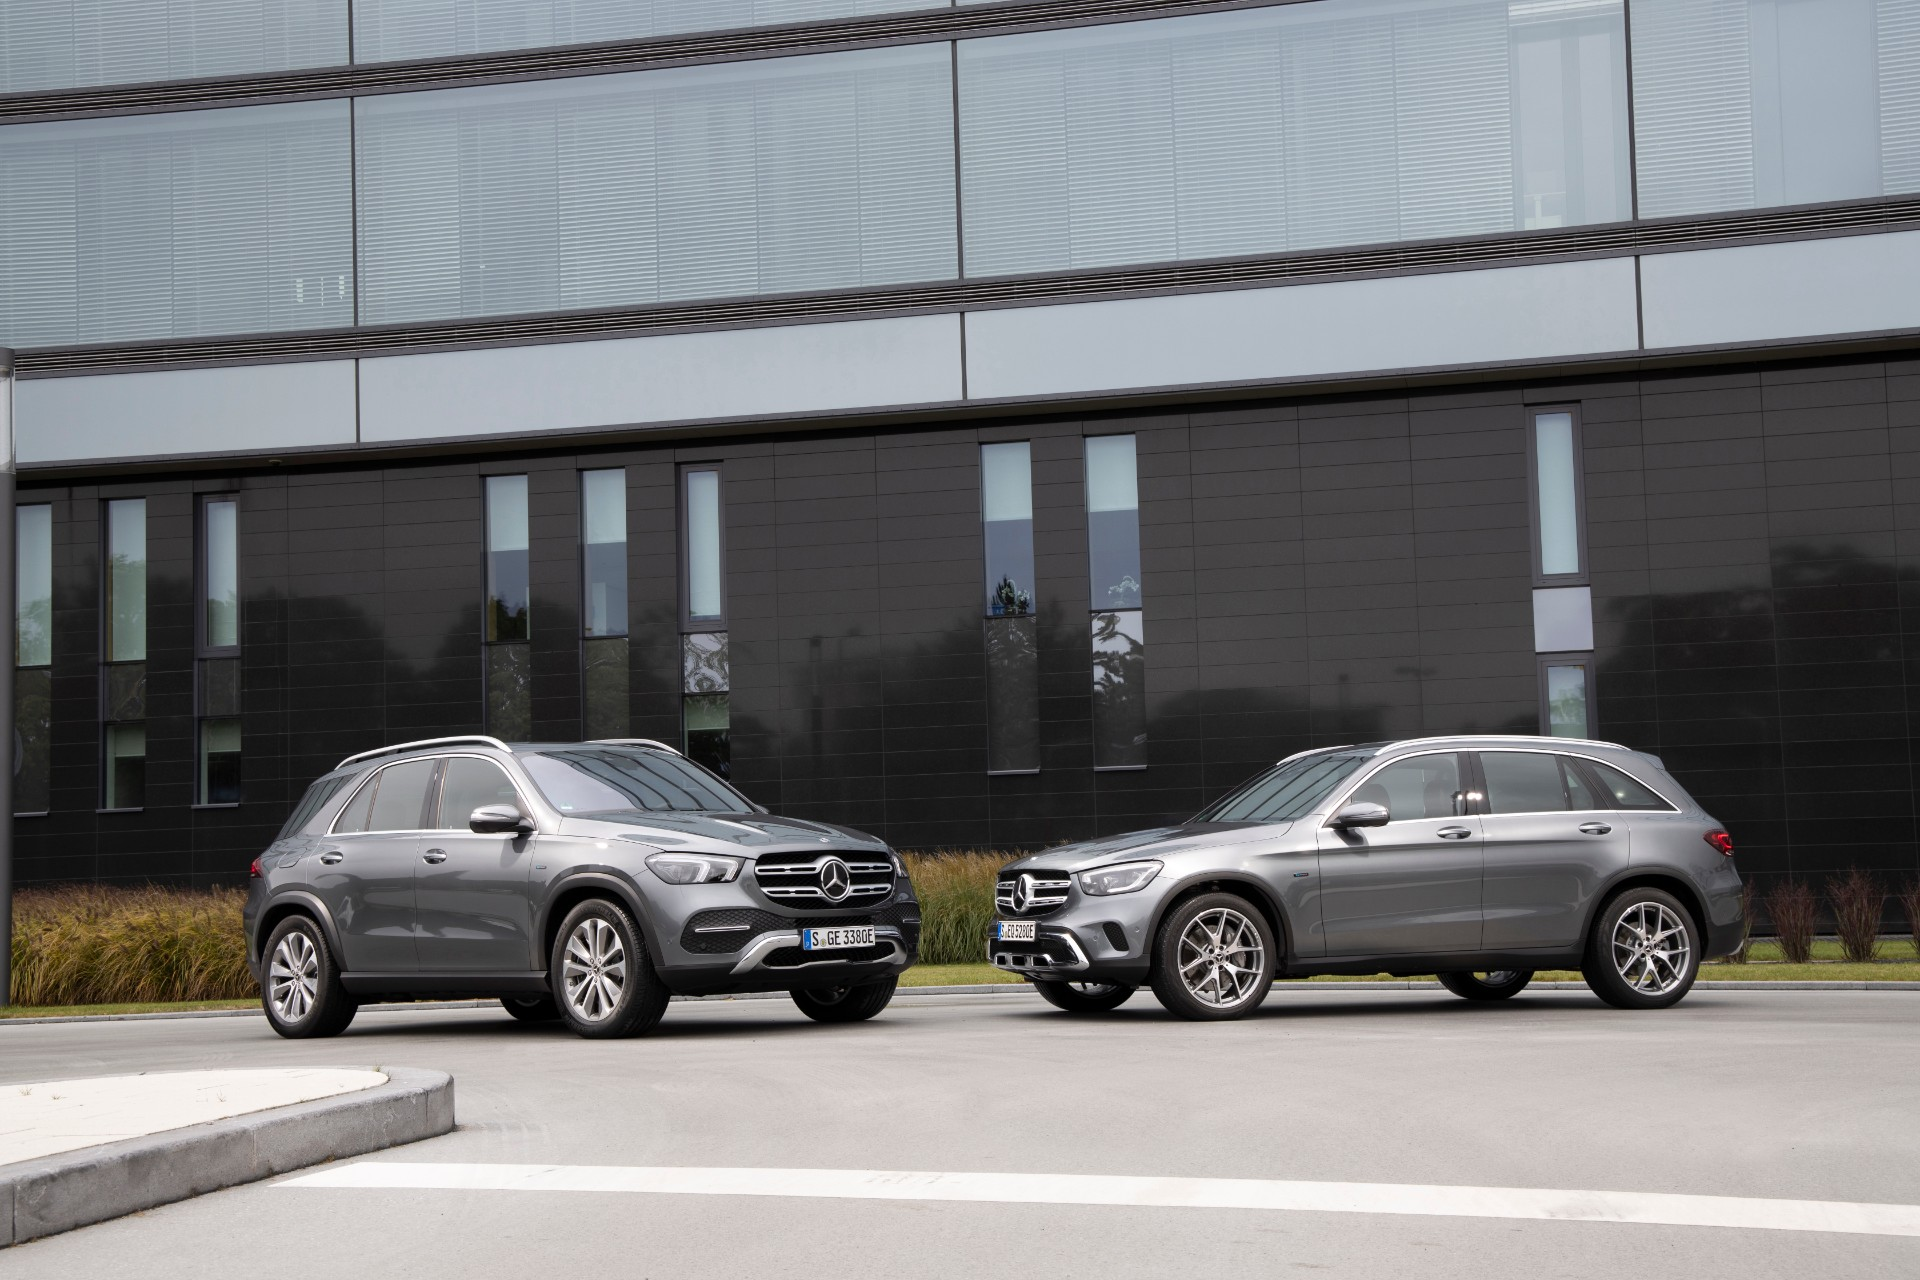 2020 Mercedes-Benz GLC350e plug-in hybrid: More electric